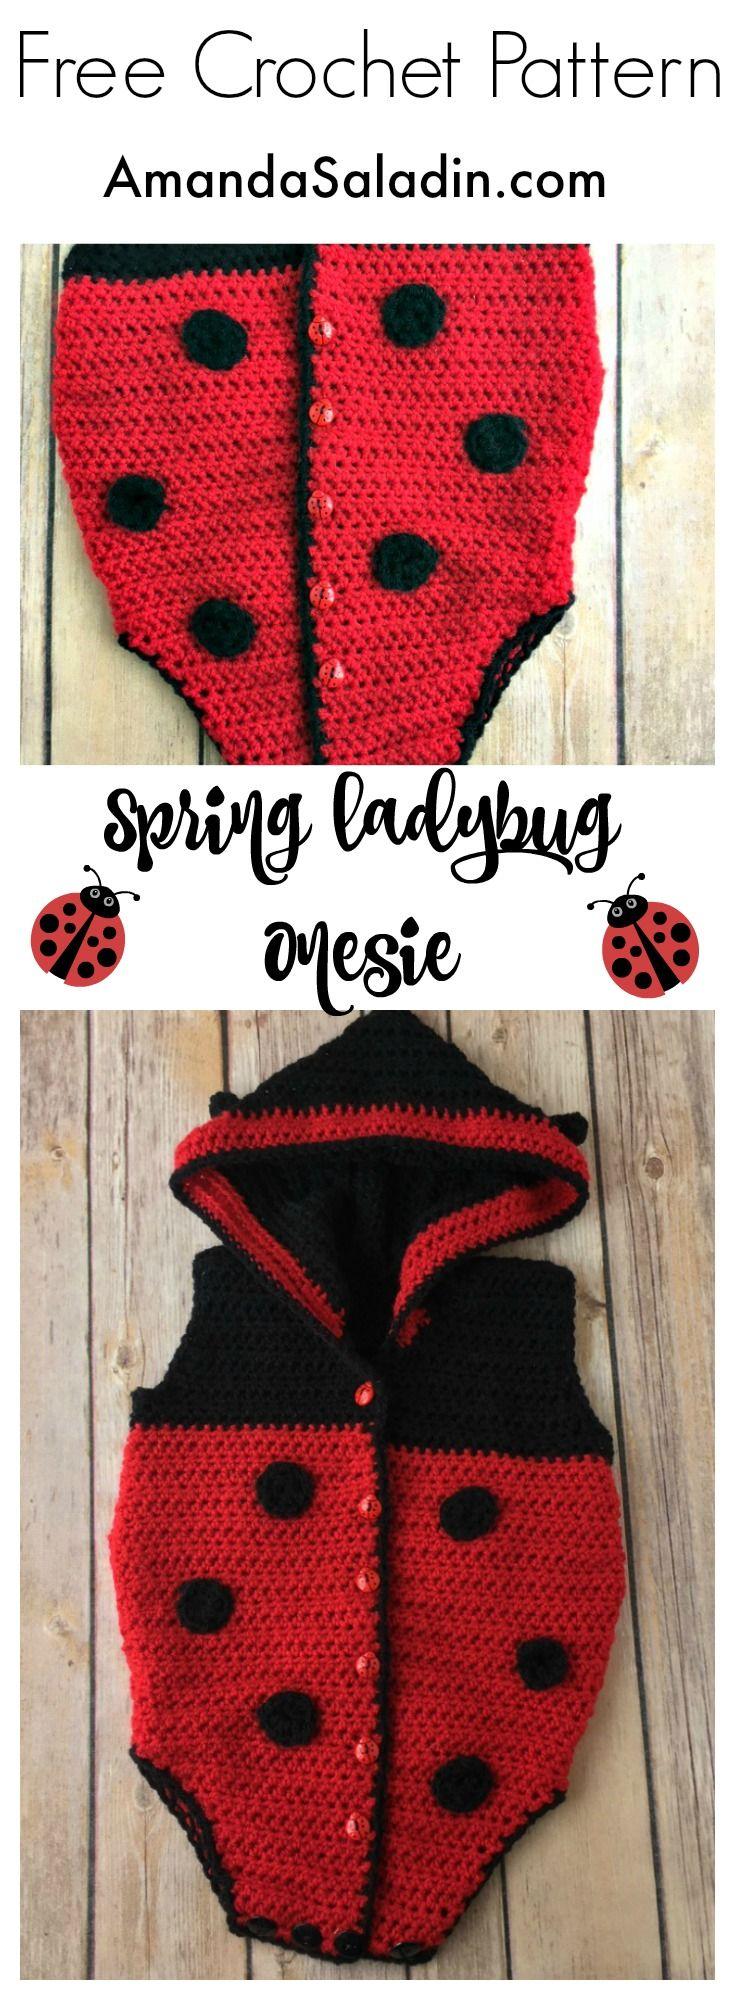 Spring ladybug onesie free crochet pattern free crochet spring ladybug onesie free crochet pattern bankloansurffo Choice Image